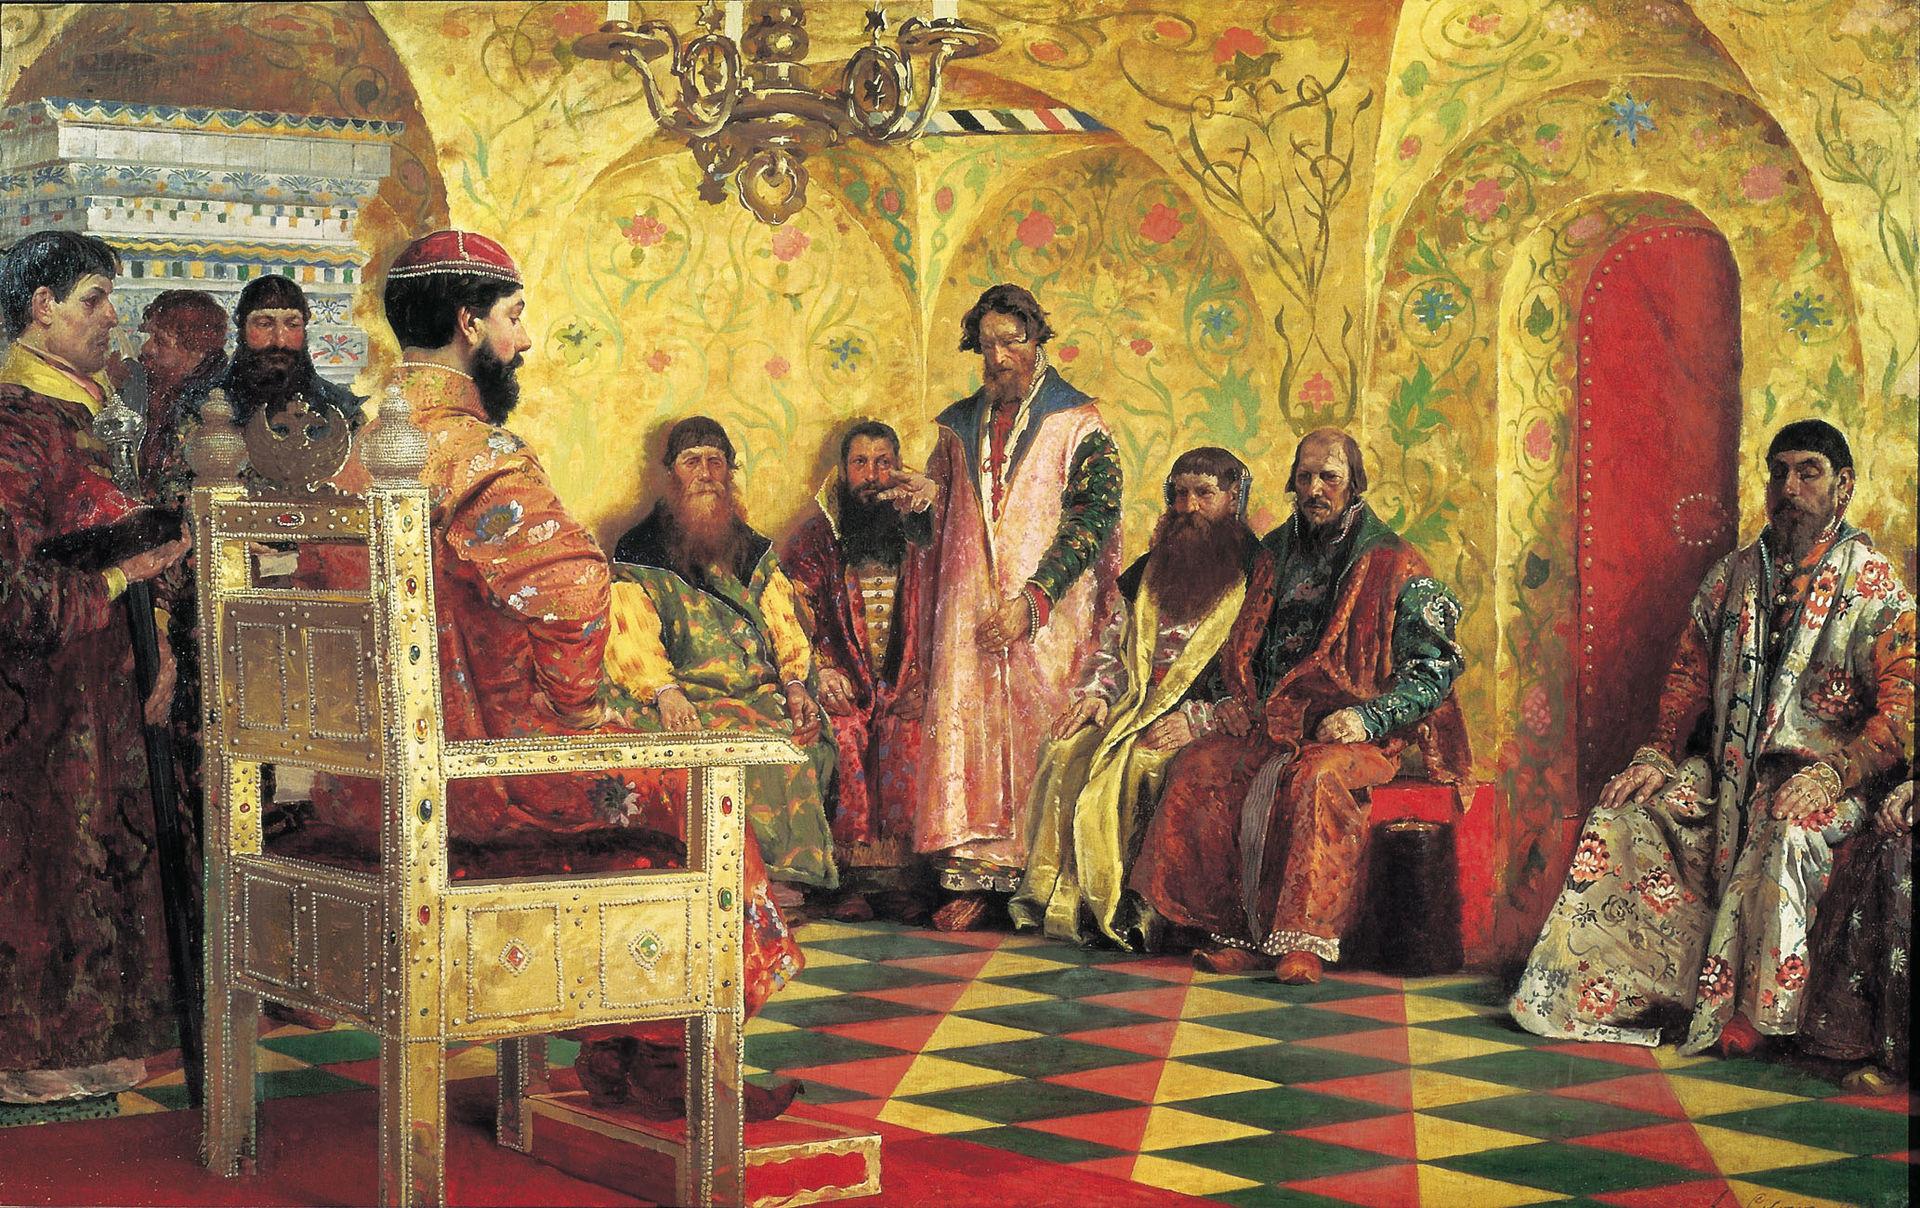 Andrey Ryabushkin. Session of Tsar Mikhail Feodorvich with his boyars in his State Chamber (1893)